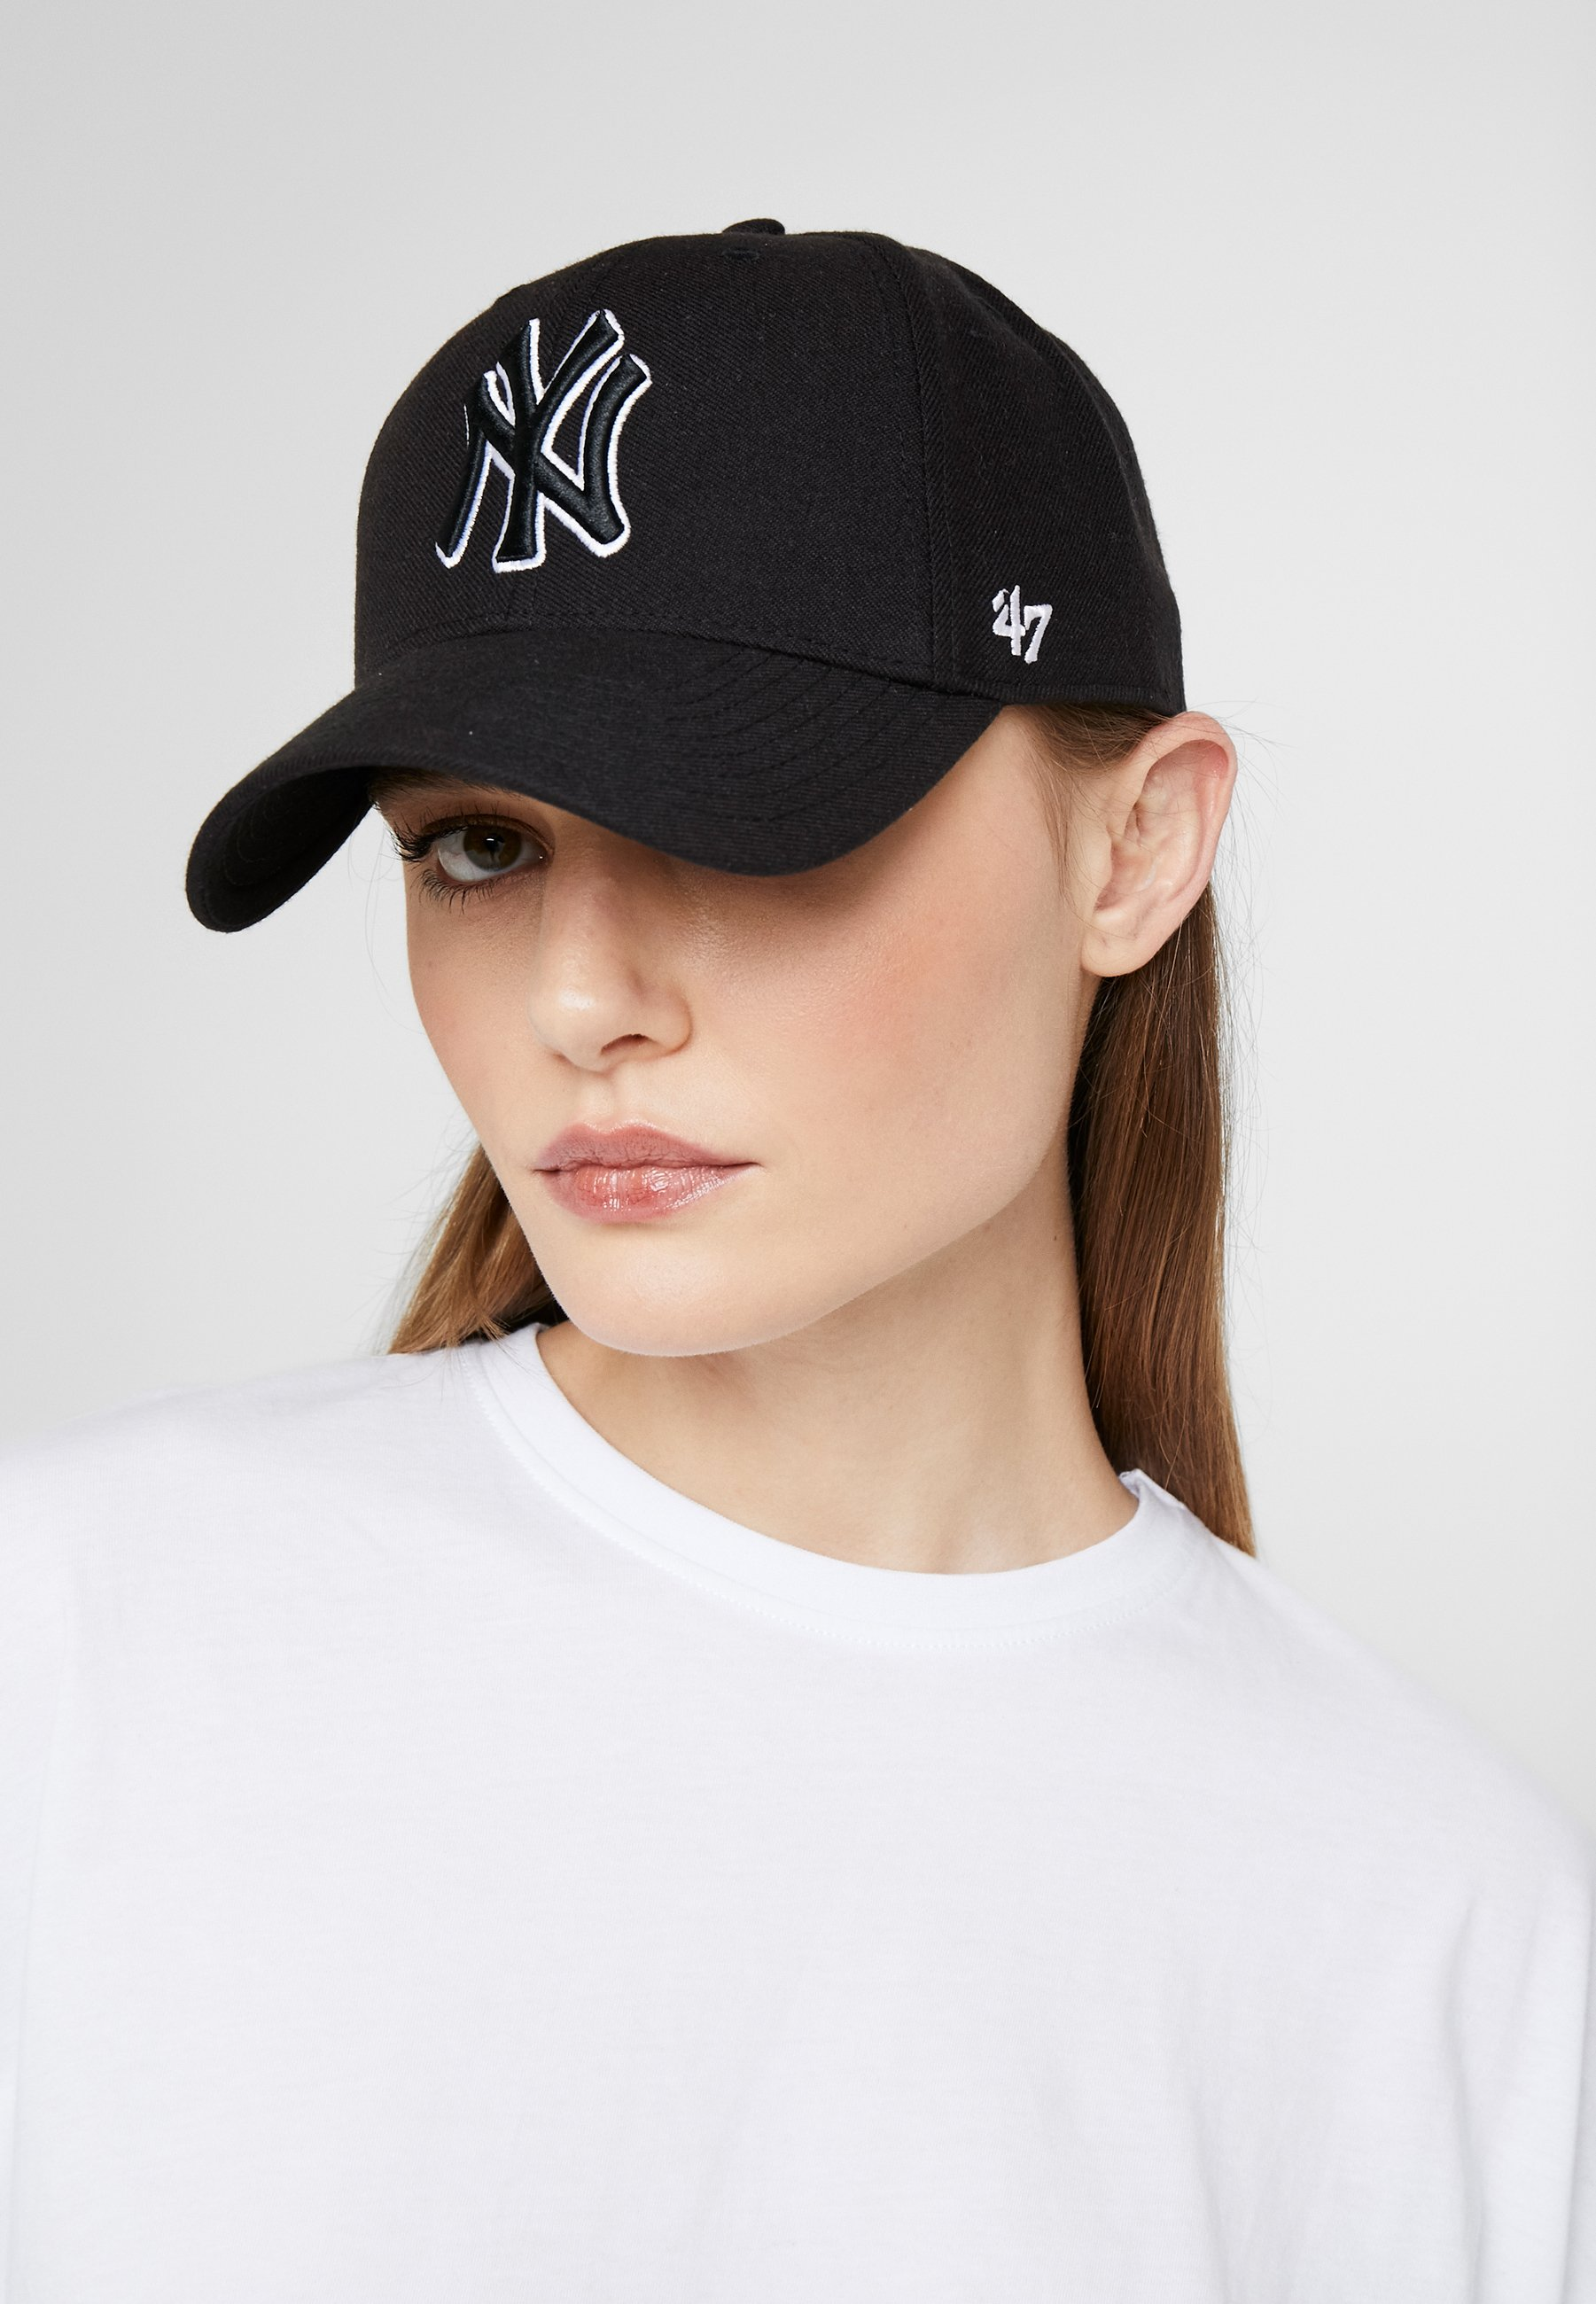 '47 NEW YORK YANKEES - Cap - black/svart 2802Y4IQKHWI3yR